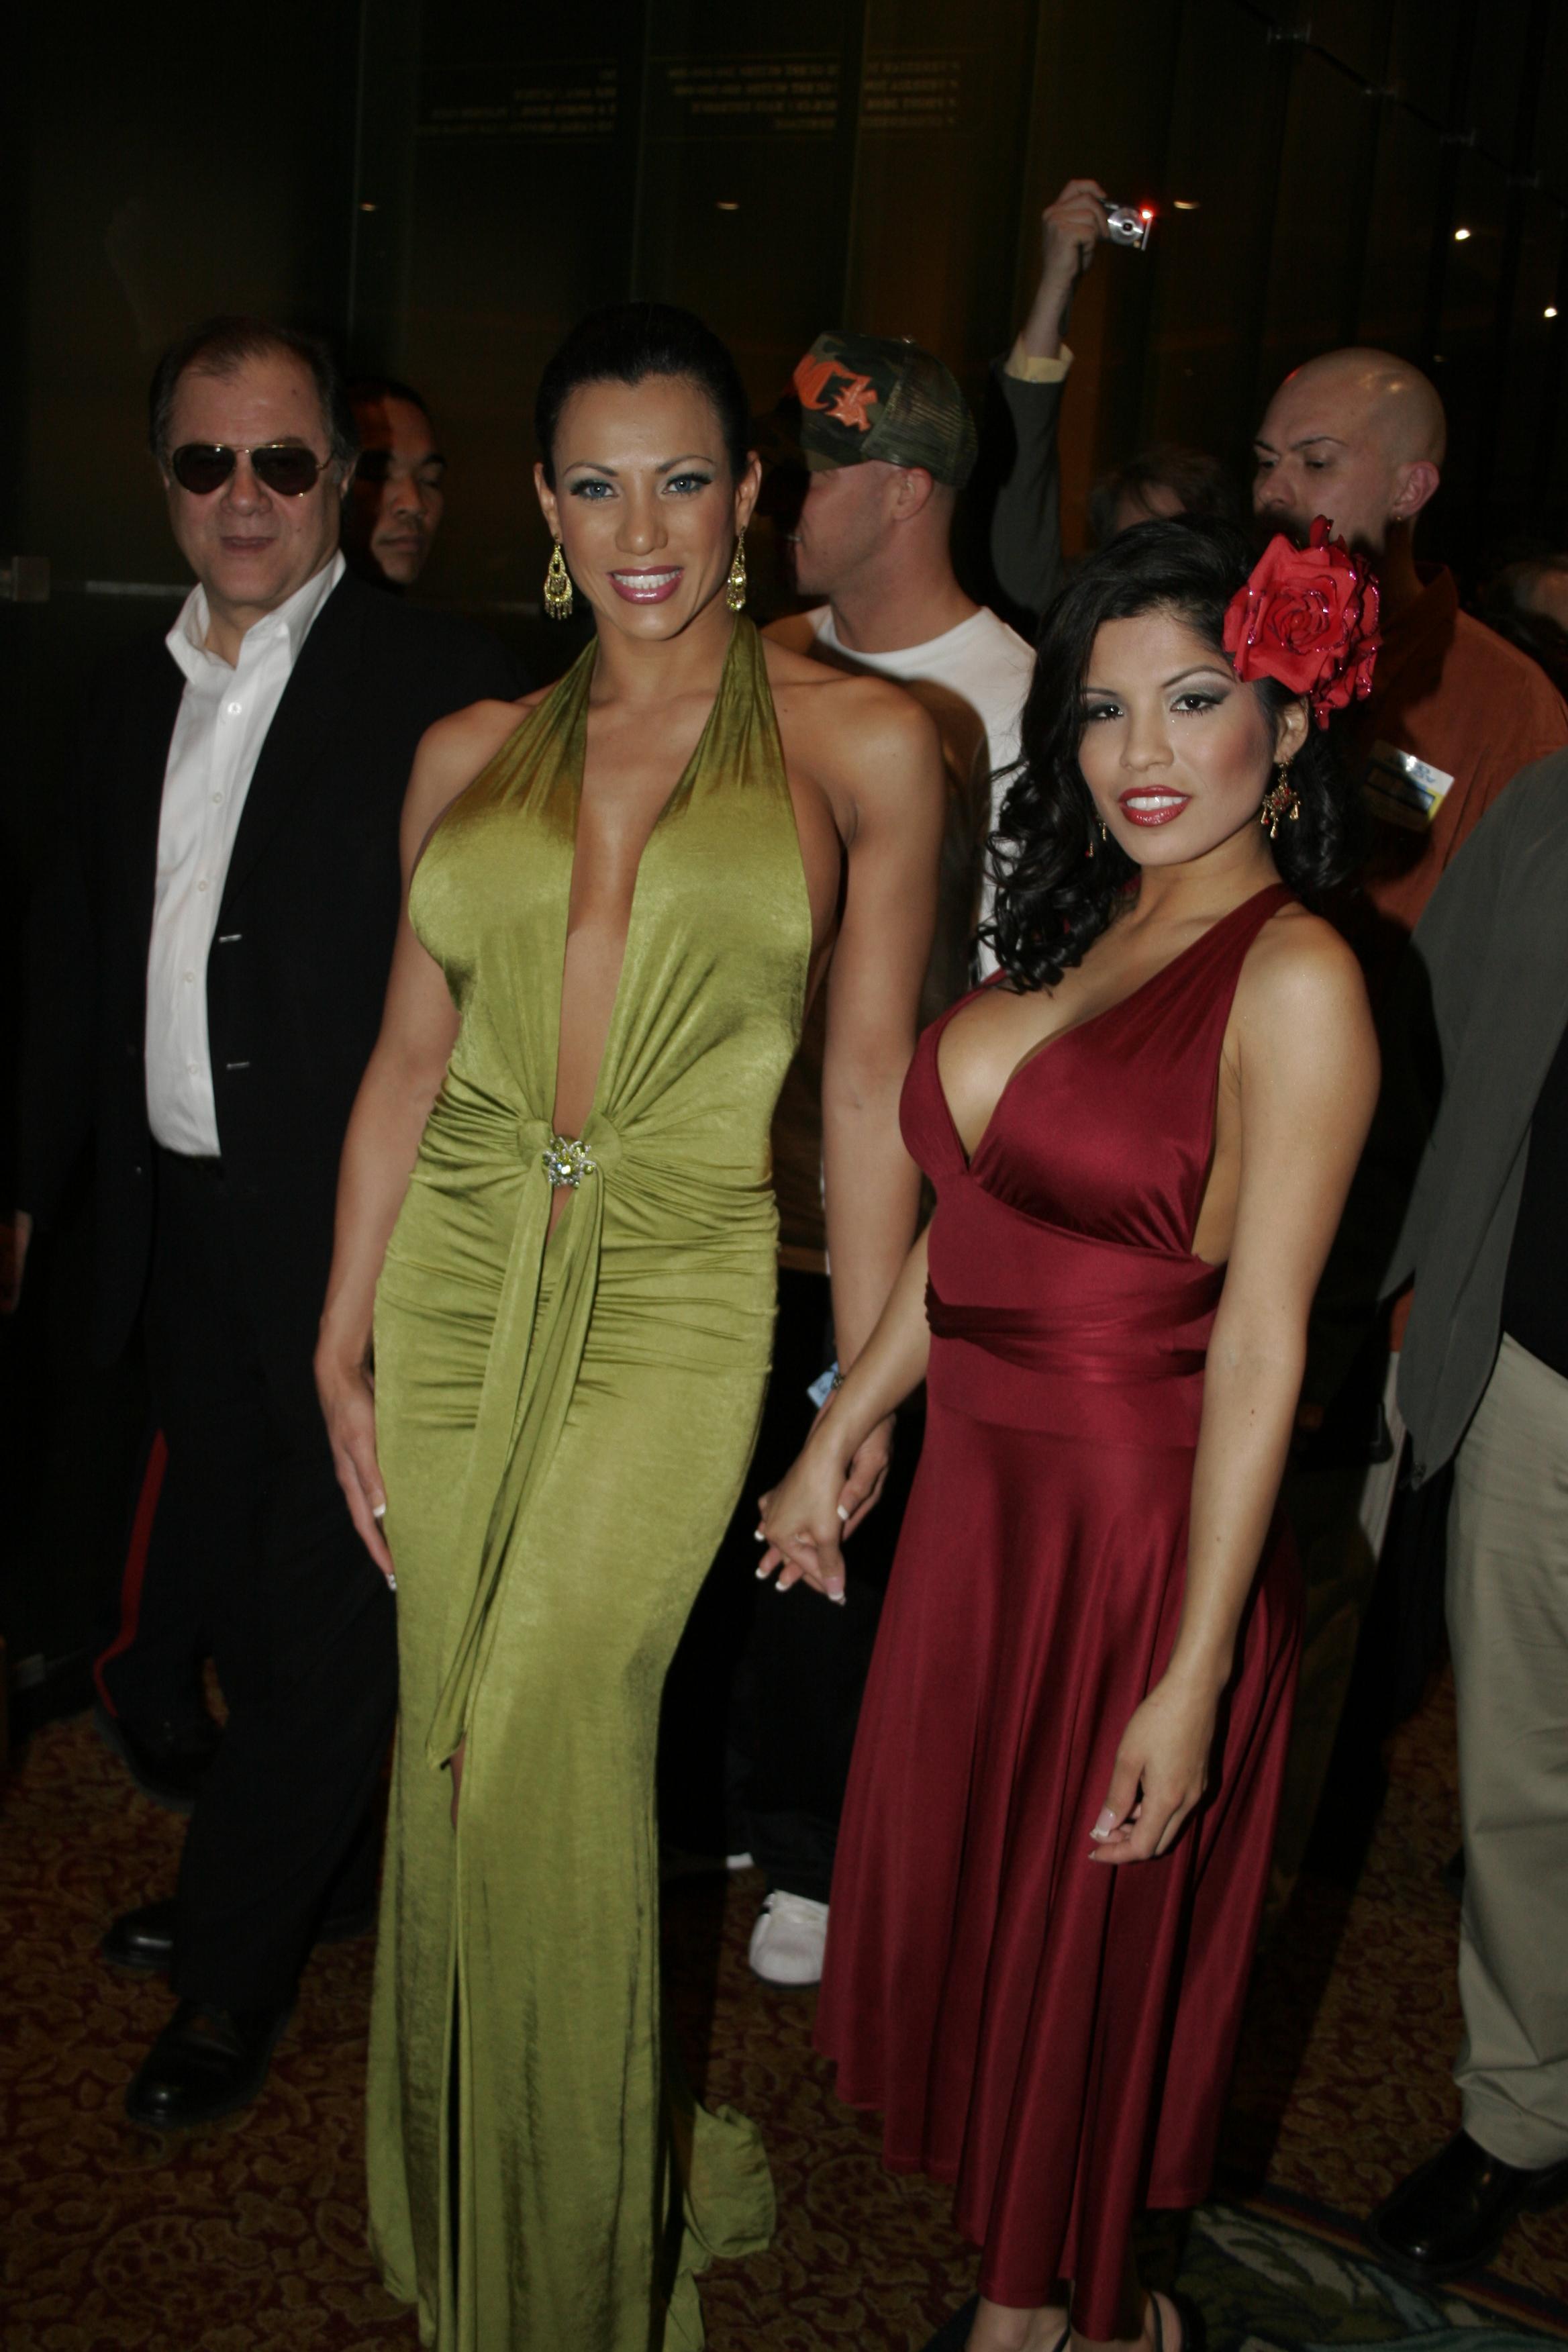 Taylor Wane Wiki >> File:Exotica, Alexis Amore AVN Awards 2006.jpg